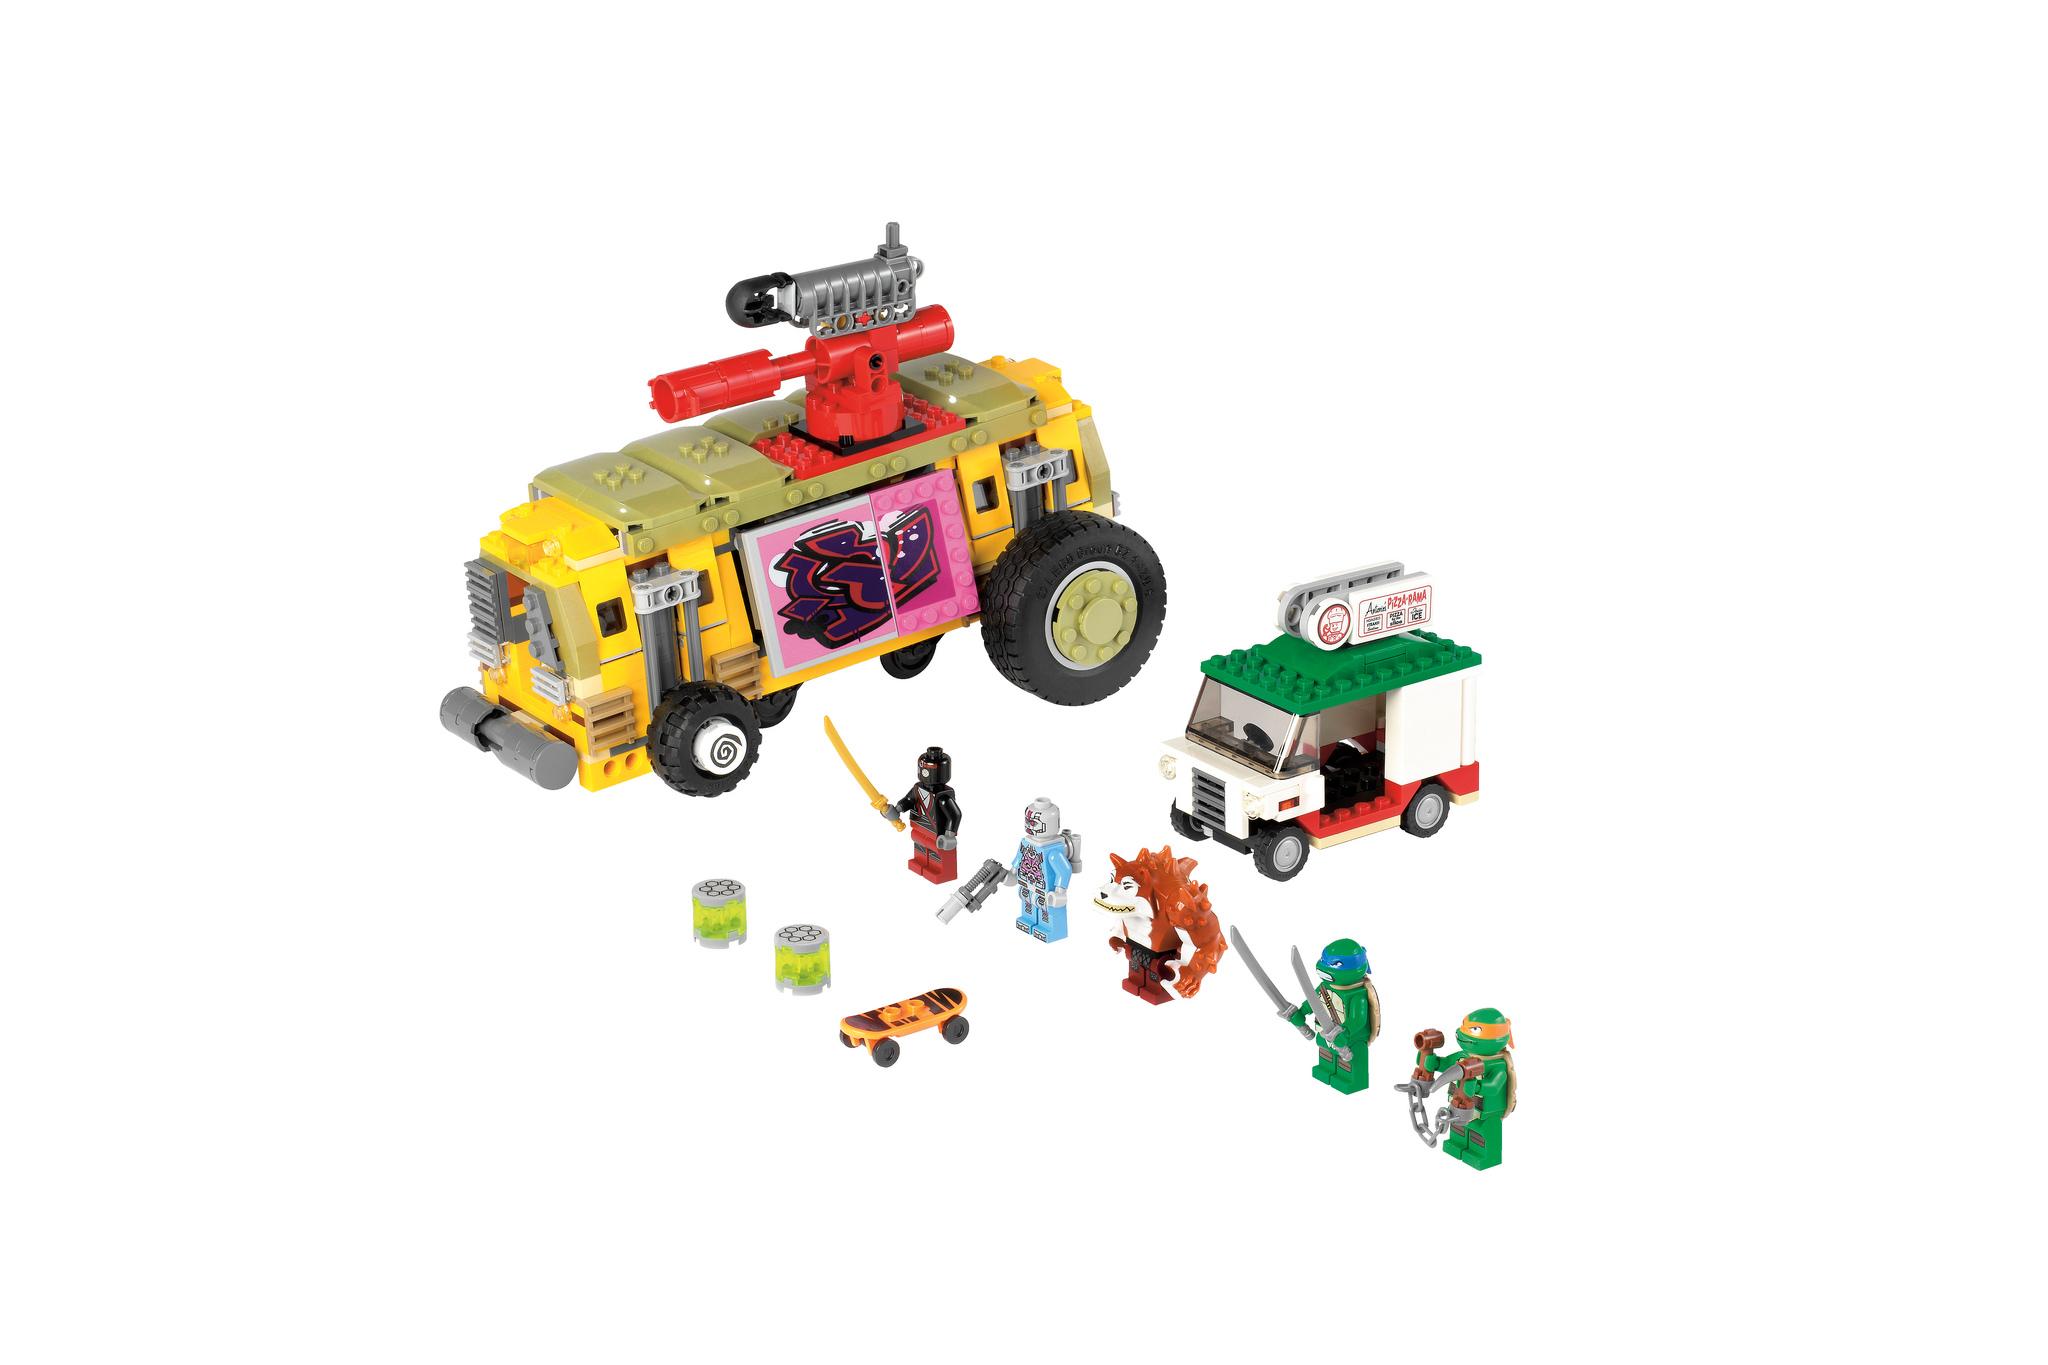 Lego Ninja Toys : Lego forums toys n bricks